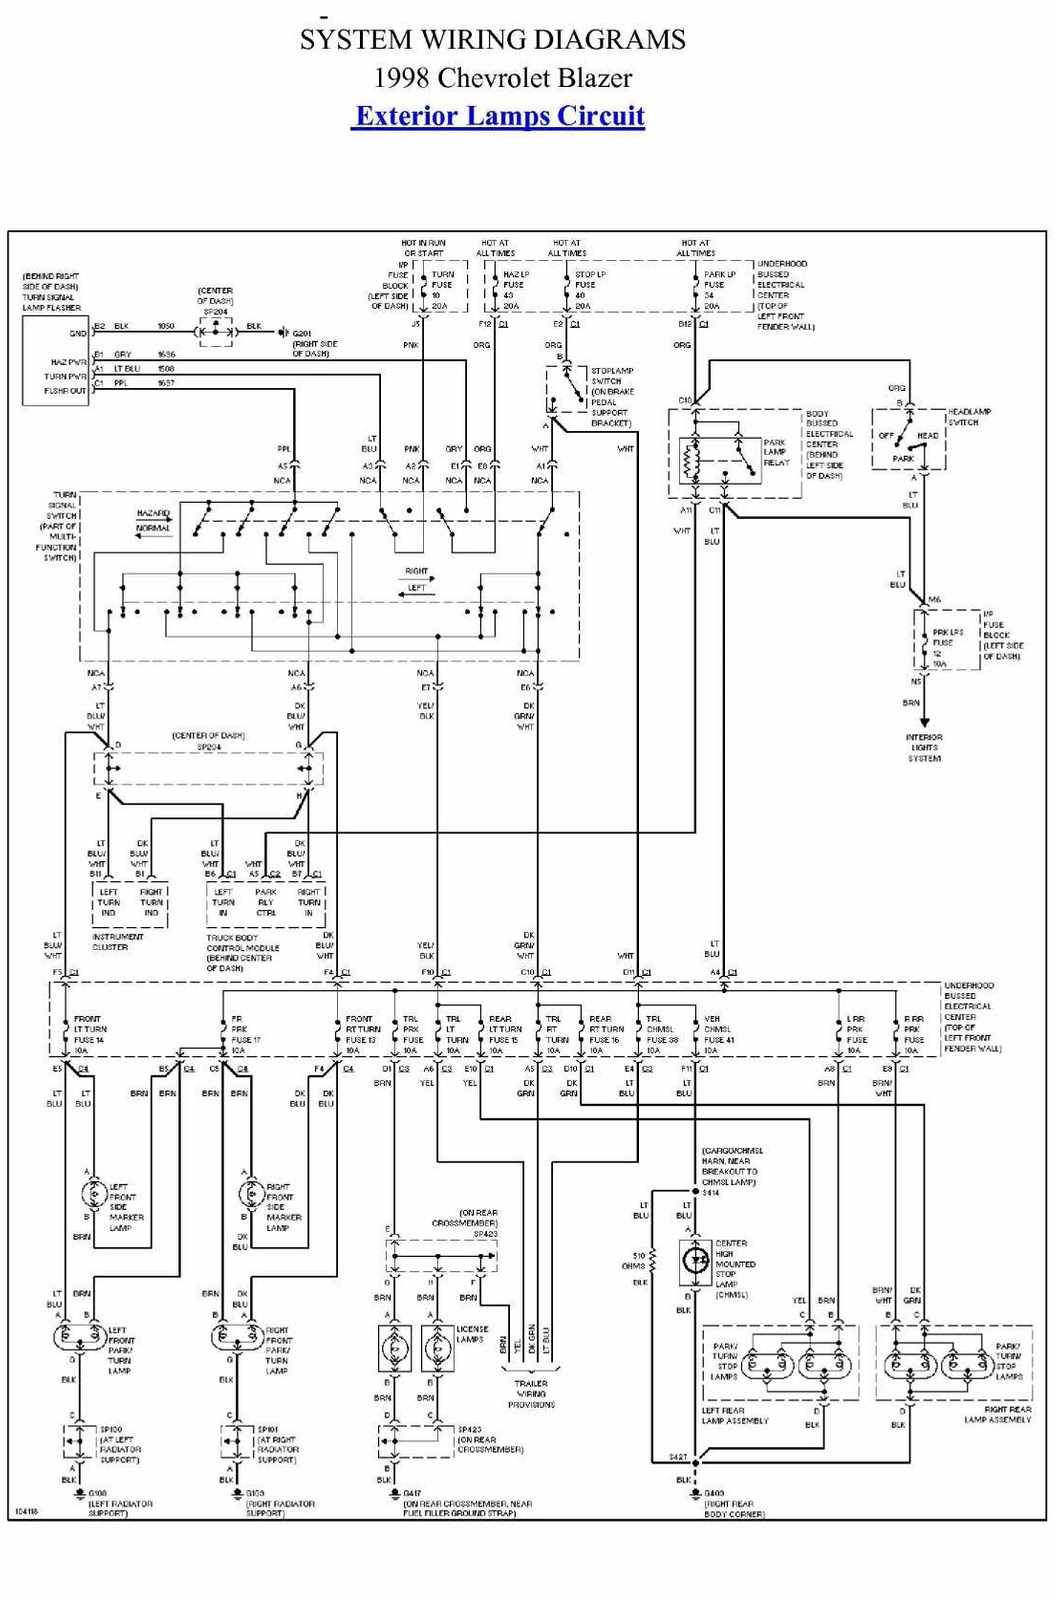 1985 K5 Blazer Fuse Panel Wiring Diagram Bathroom Fan Light Heater 93 Box Ssr Elsavadorla